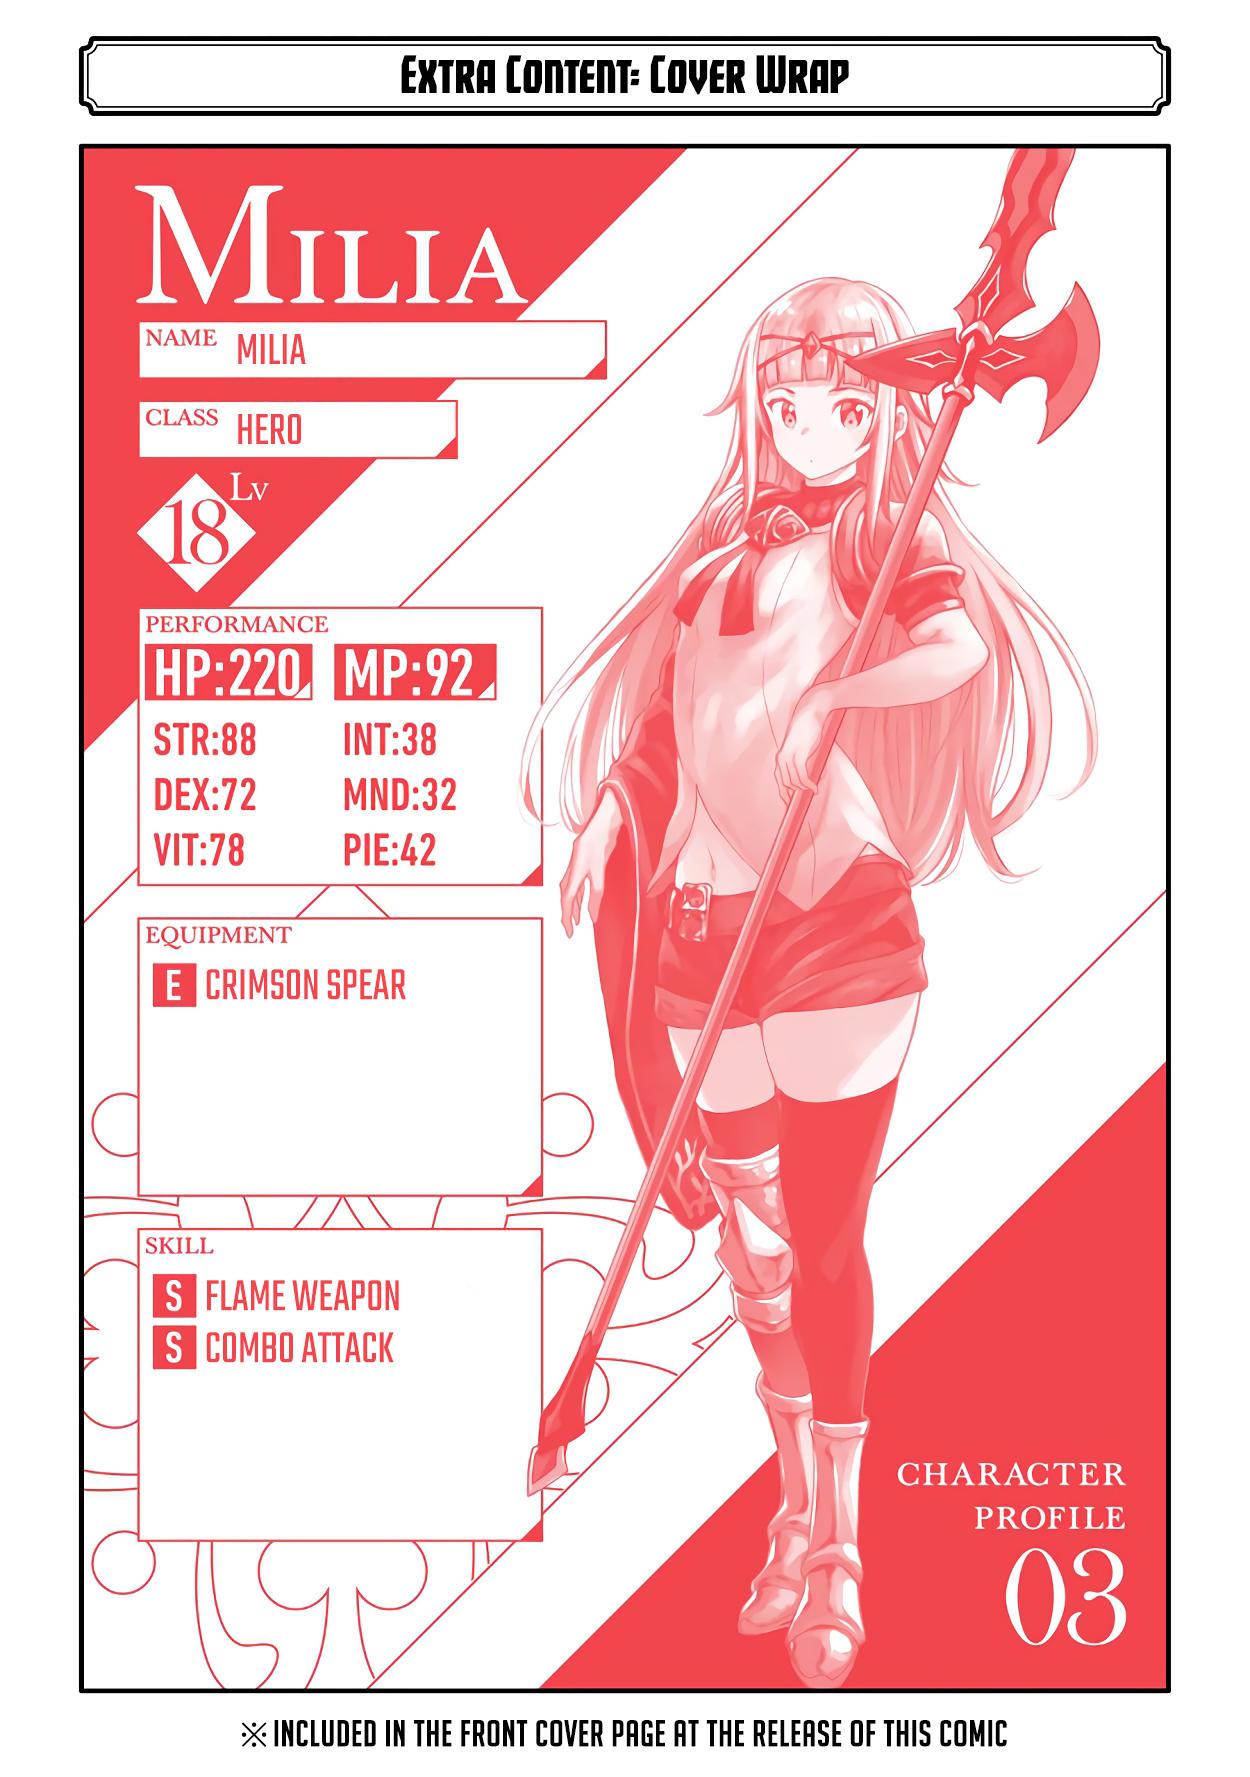 Isekai Kenja No Tensei Musou ~Geemu No Chishiki De Isekai Saikyou~ Vol.3 Chapter 14.4: Milia's Determination page 10 - Mangakakalots.com